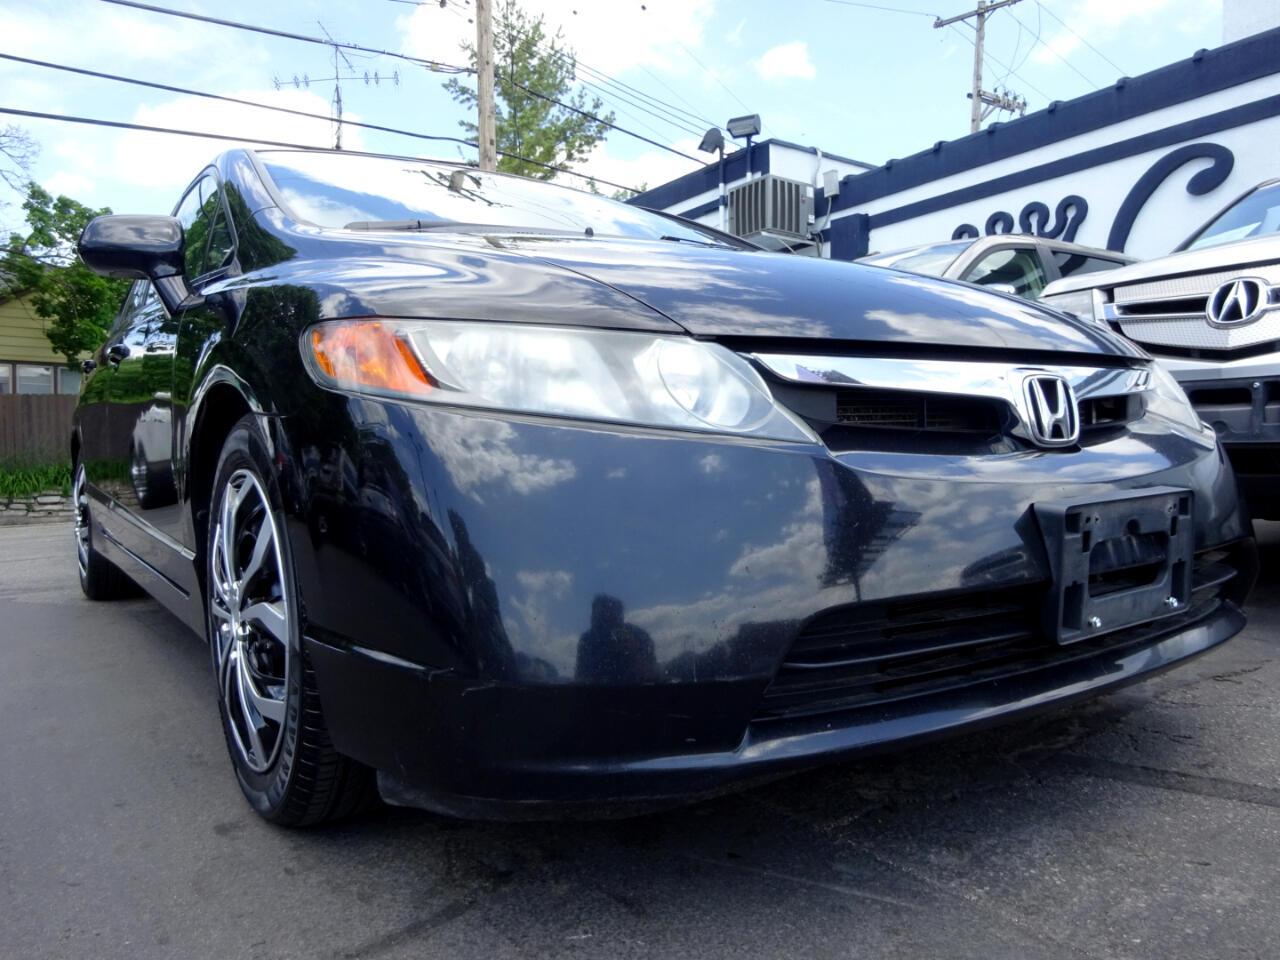 Honda Civic Sdn 4dr Auto LX 2008